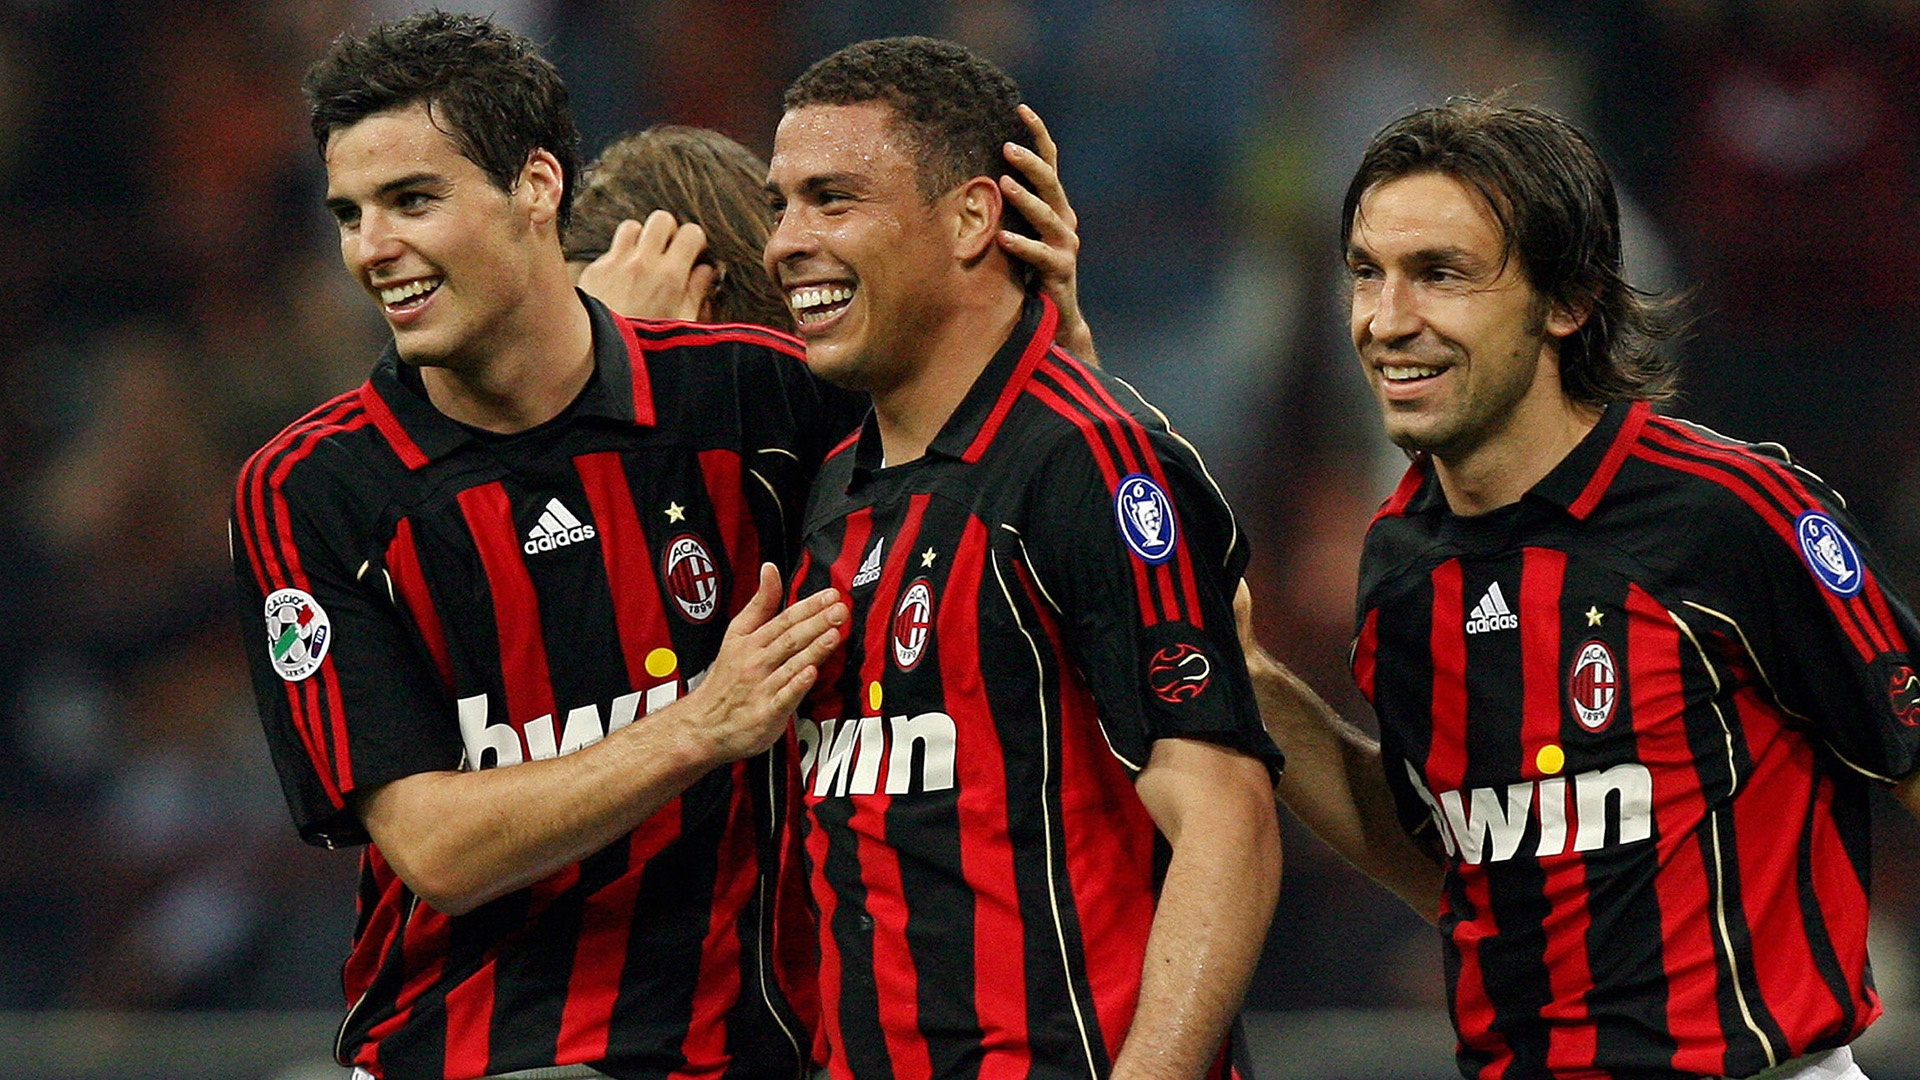 Ronaldo was an absolute phenomenon, says Ancelotti - BeSoccer